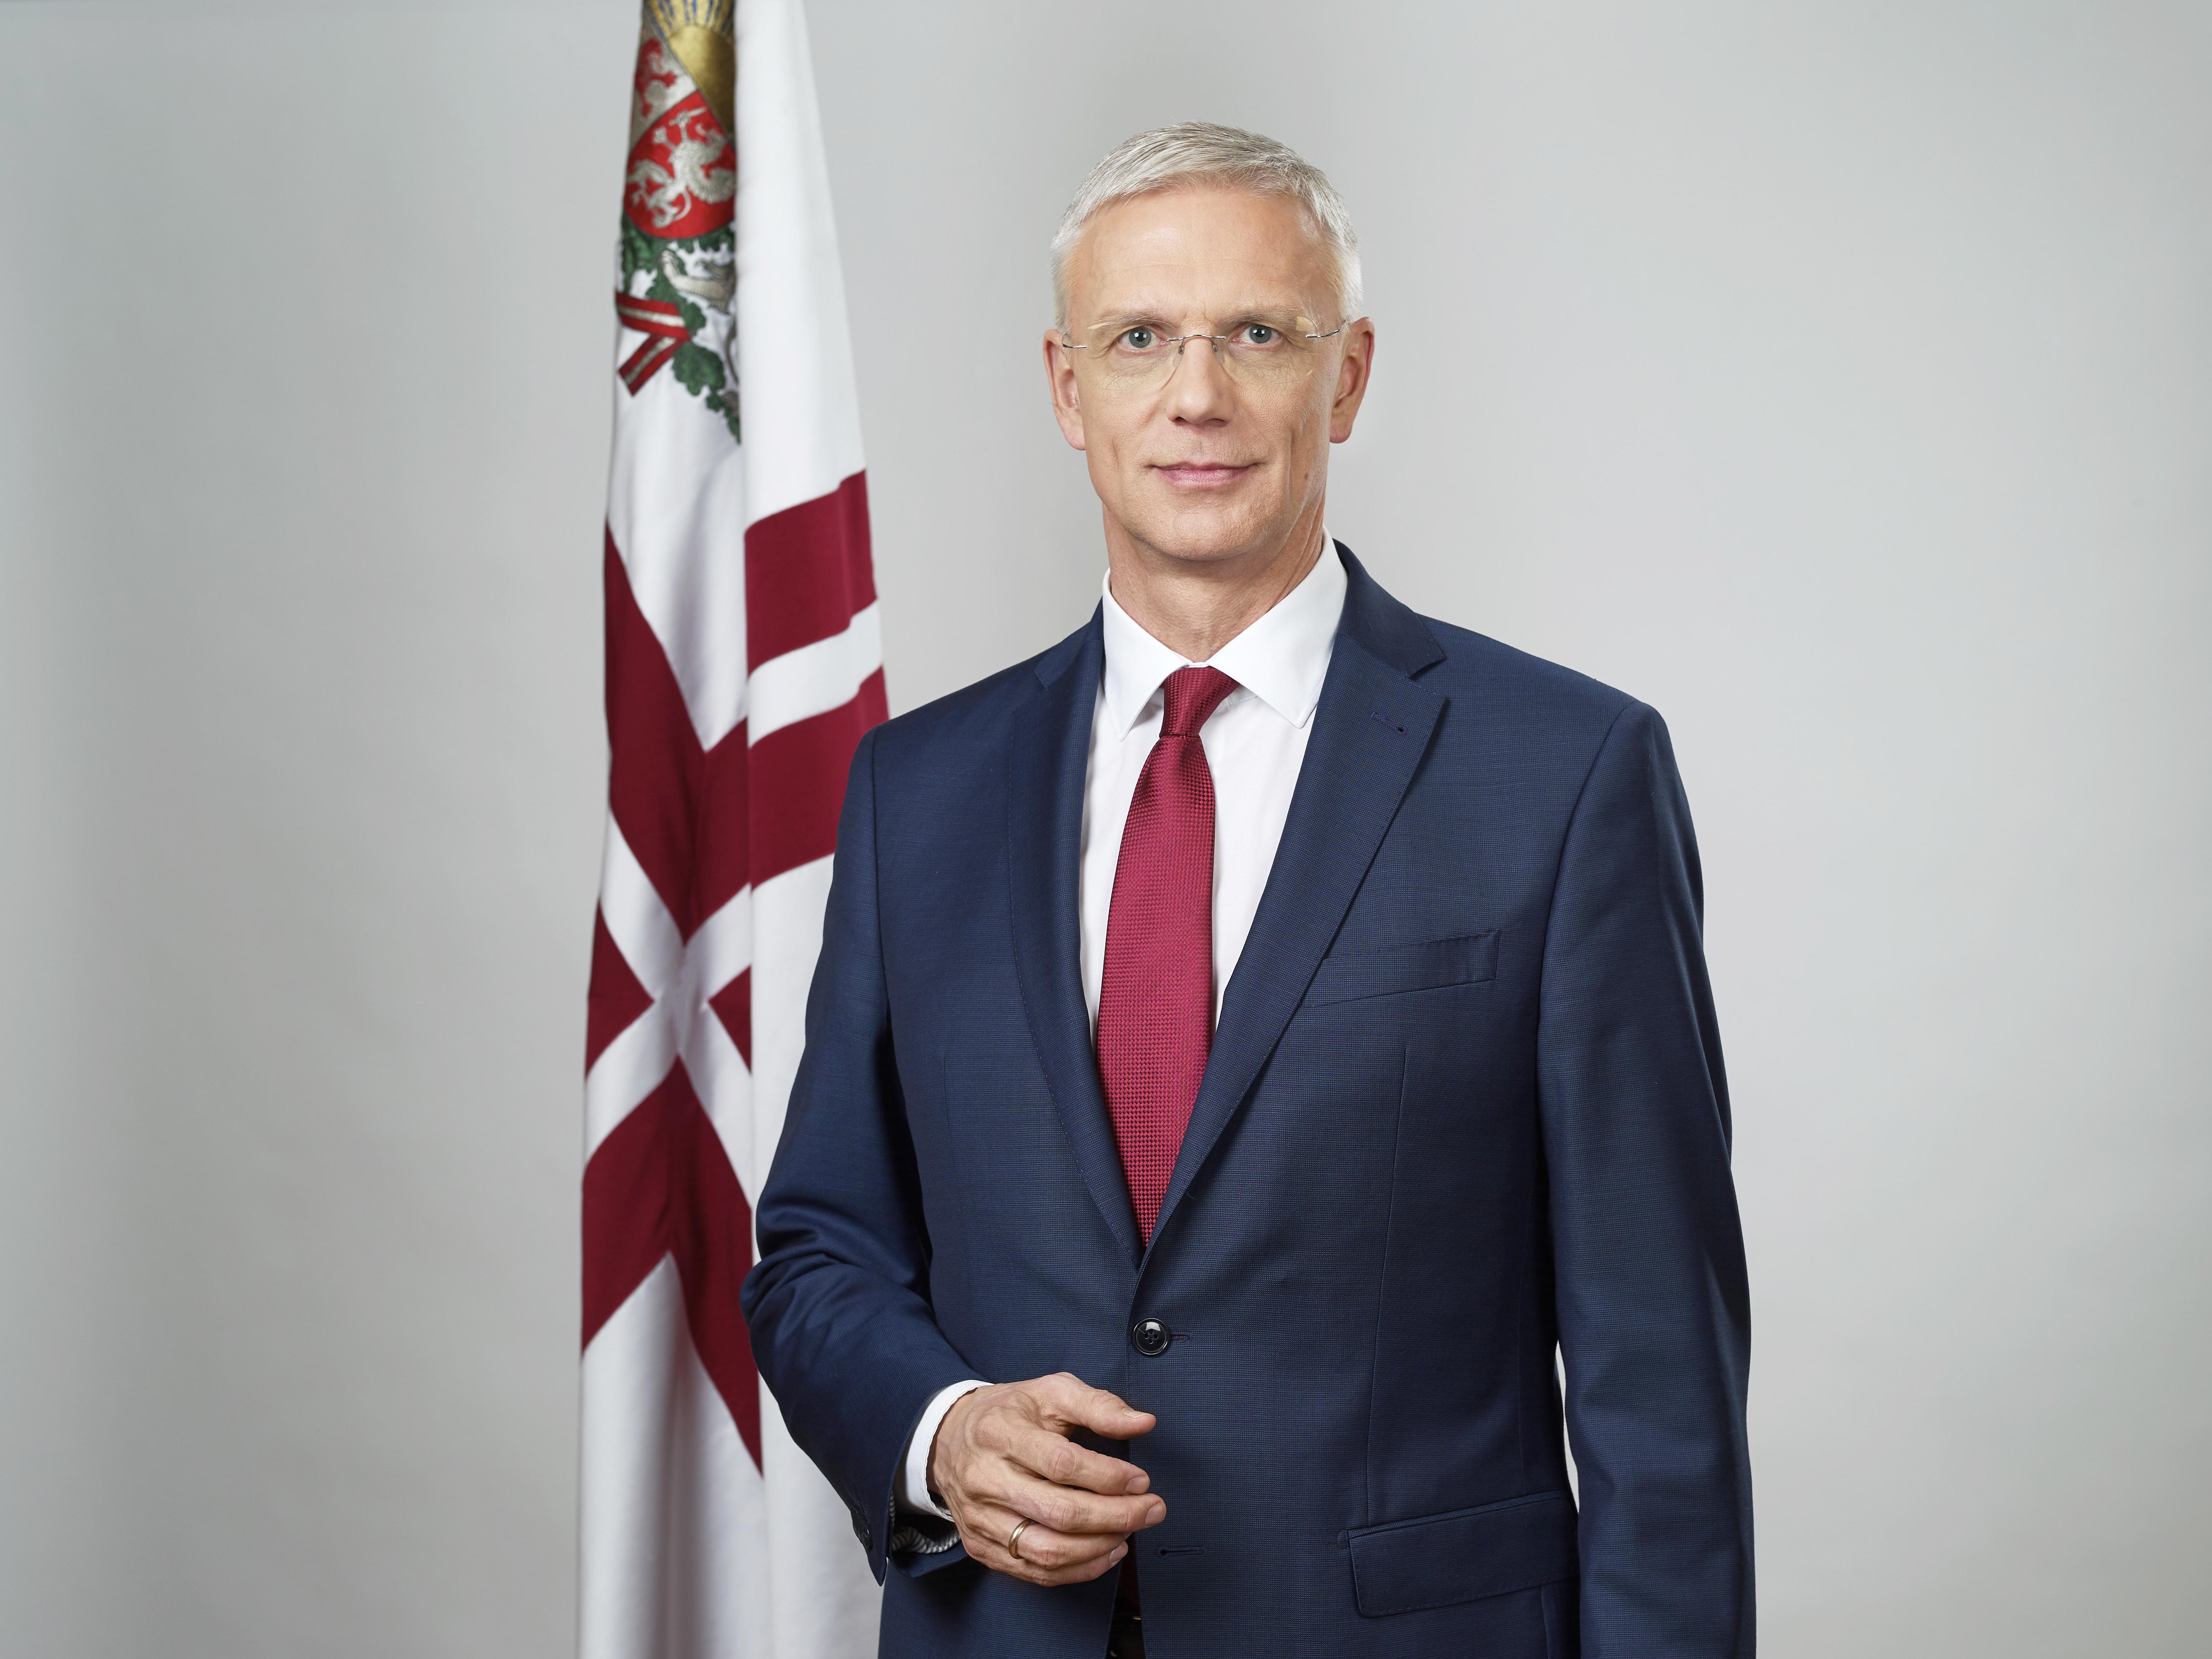 Krisjanis Karins